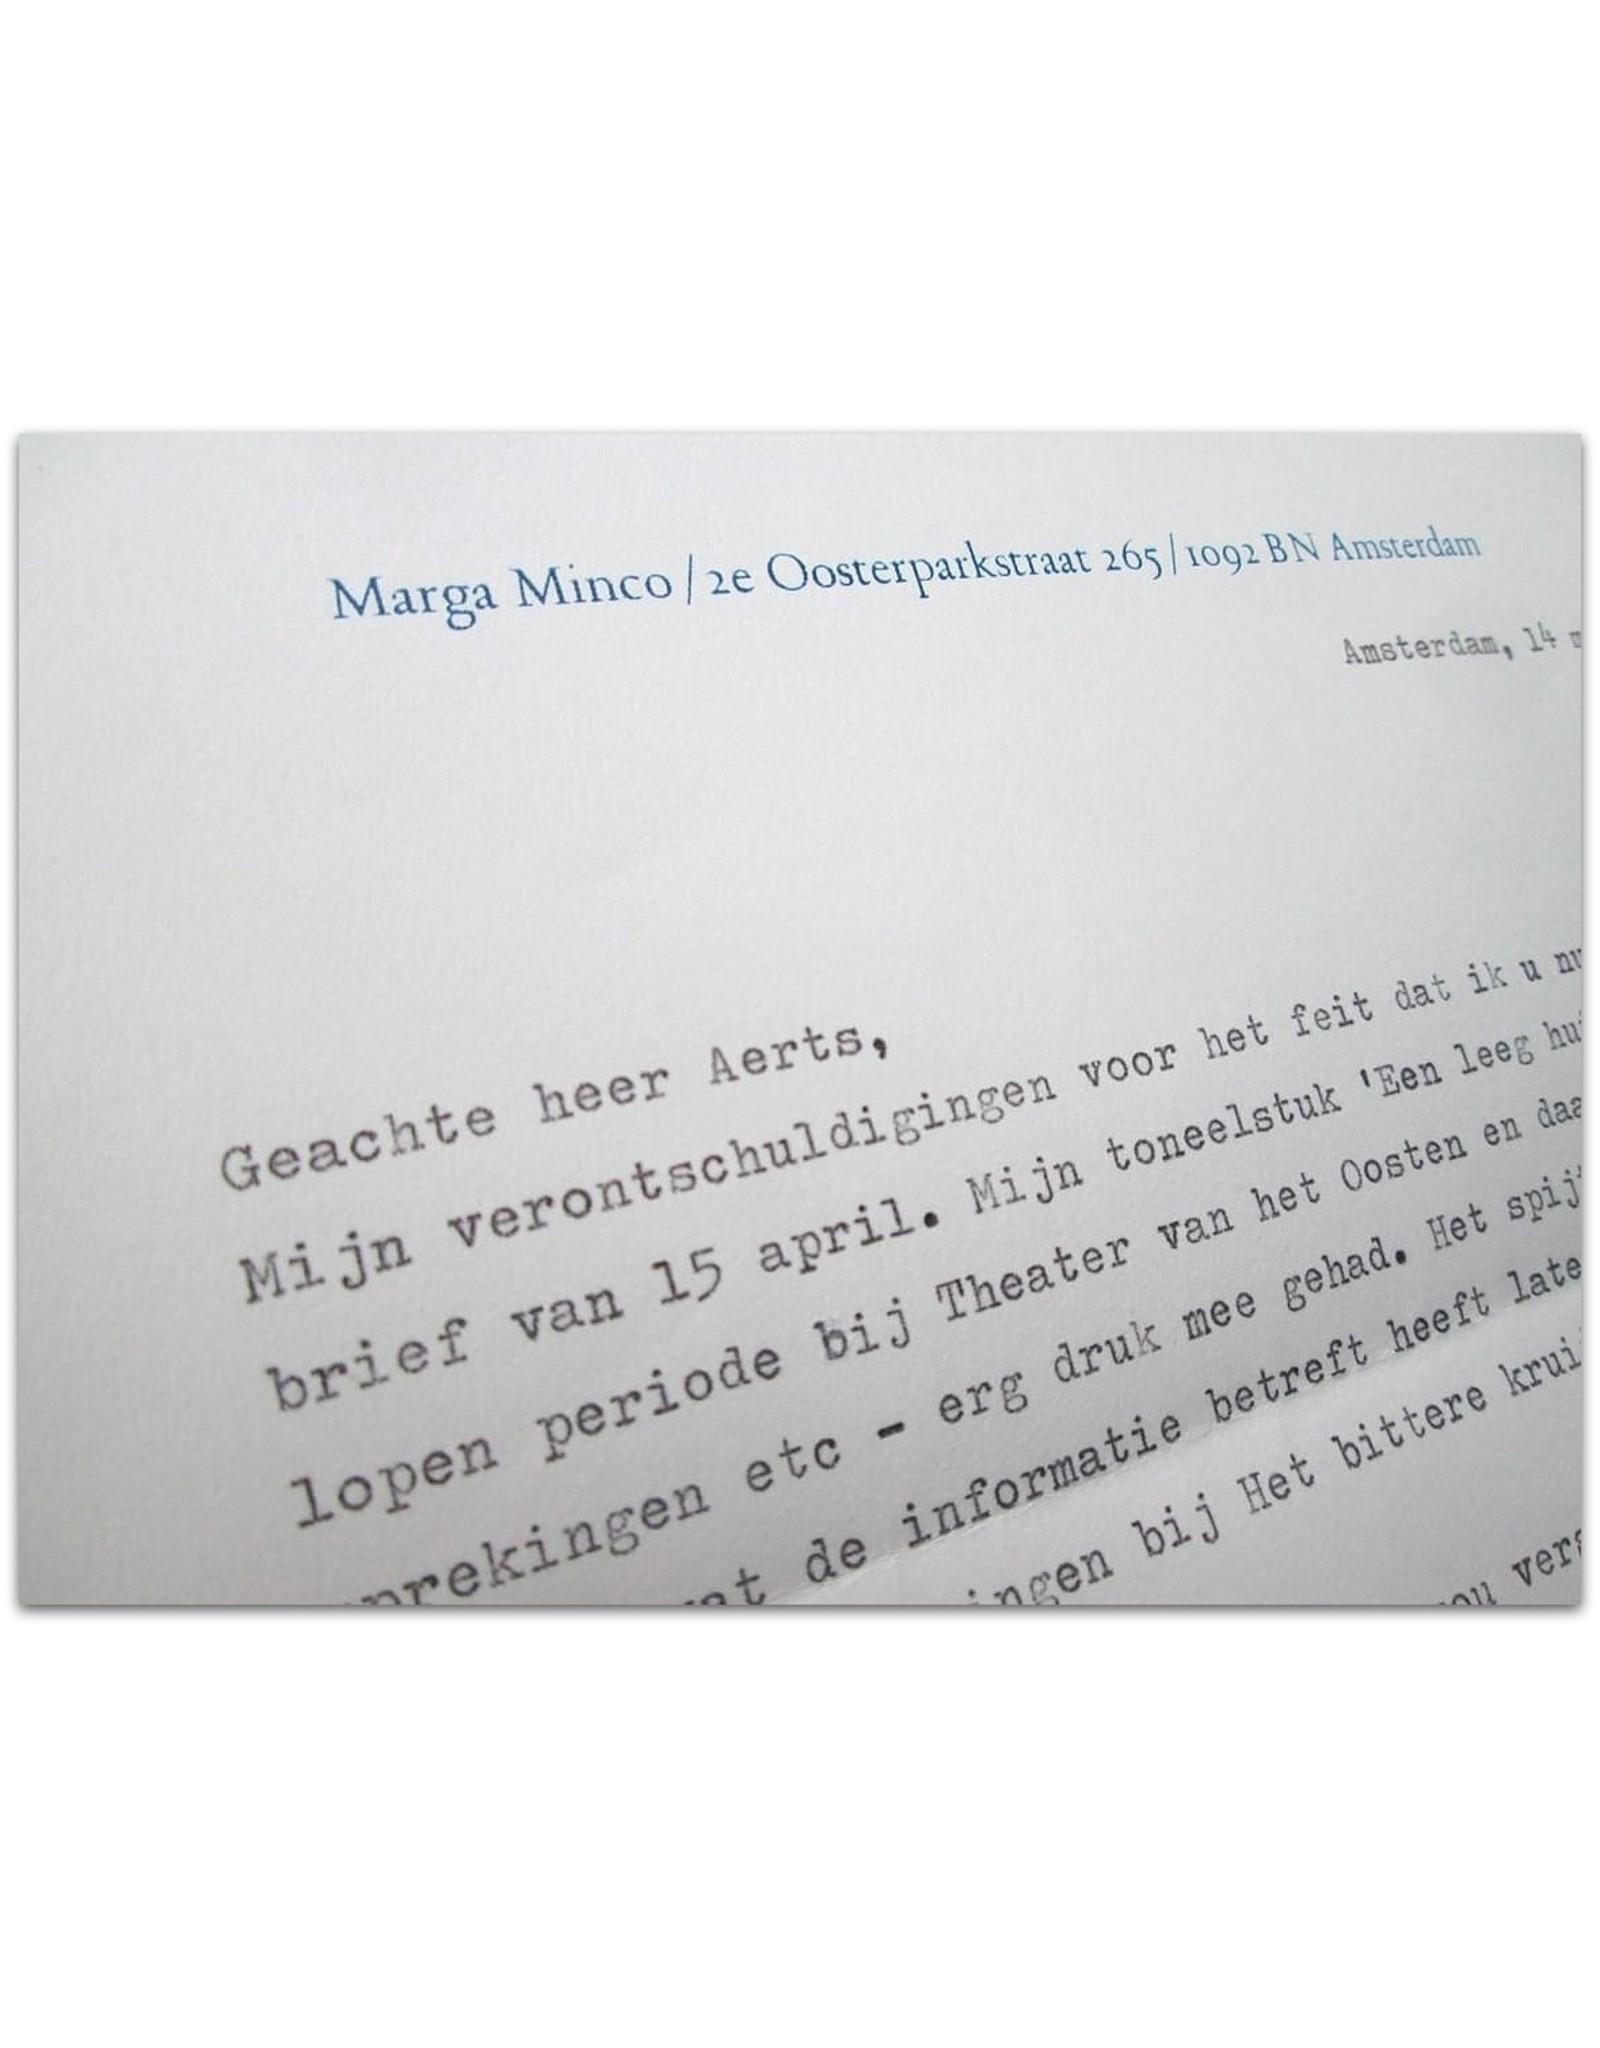 Marga Minco - Geachte heer Aerts,  [Originele brief in typoscript]